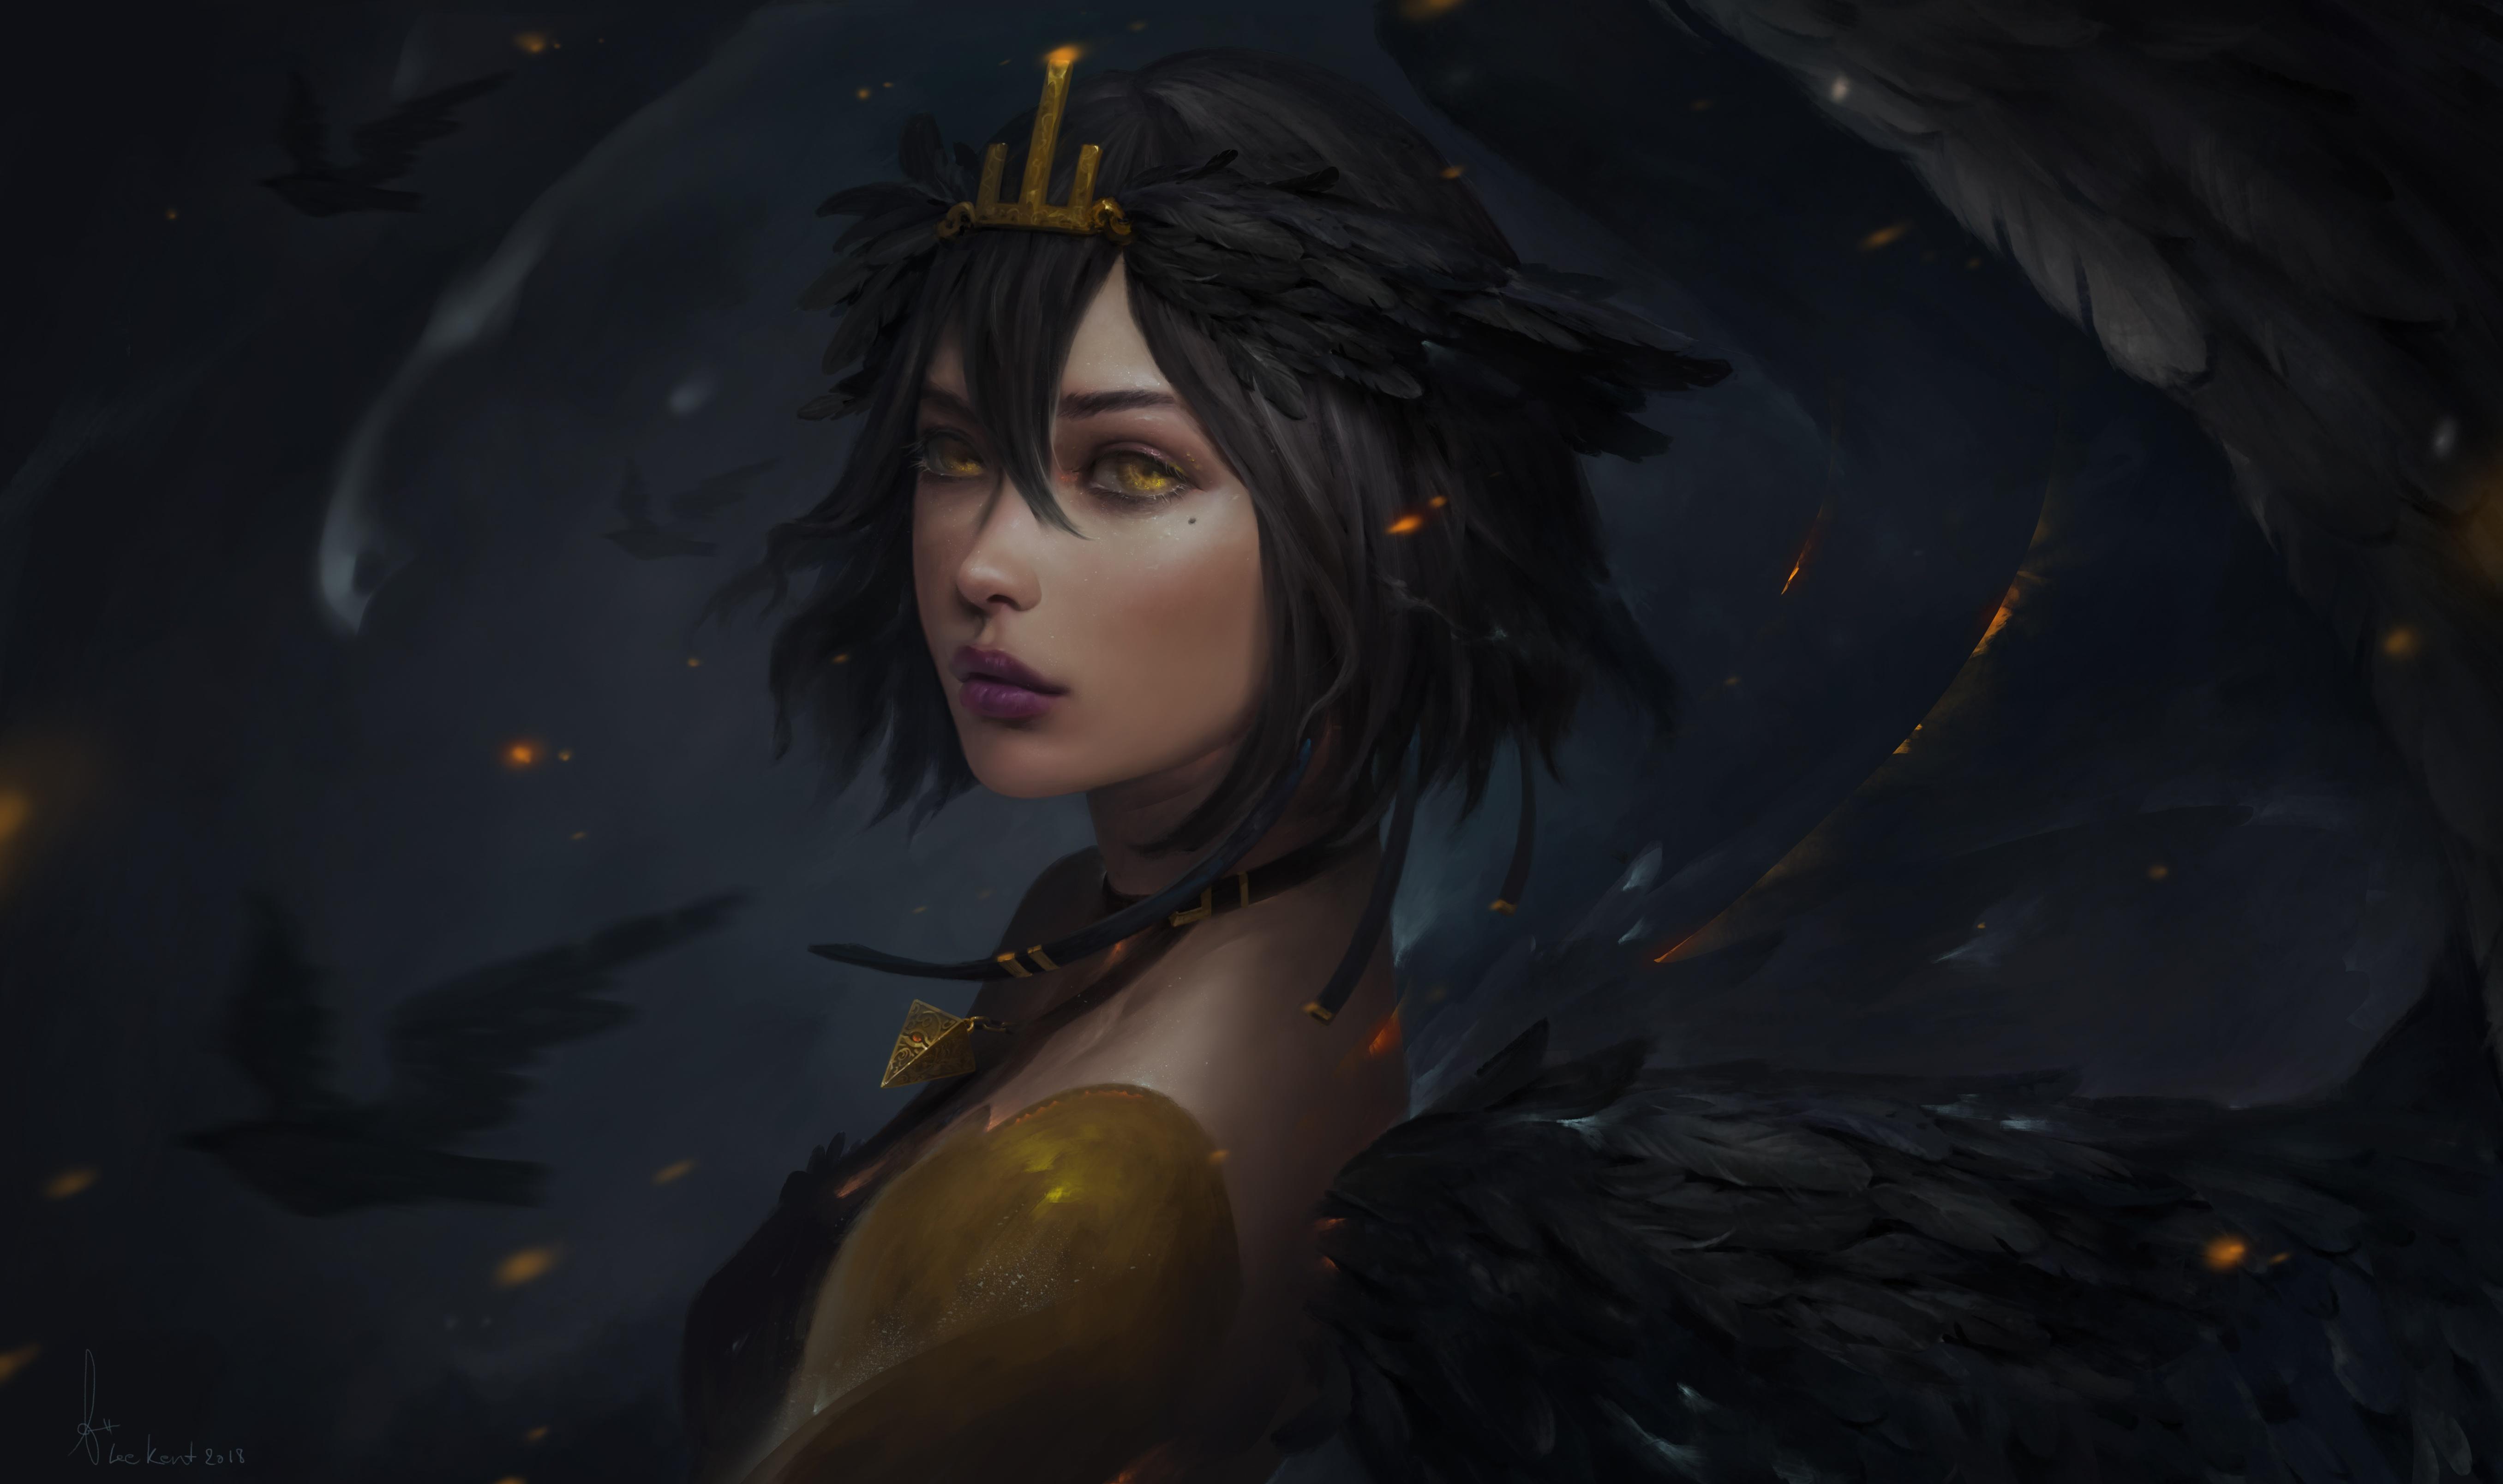 Angel Black Hair Girl Lipstick Short Hair Woman Yellow Eyes 5424x3216